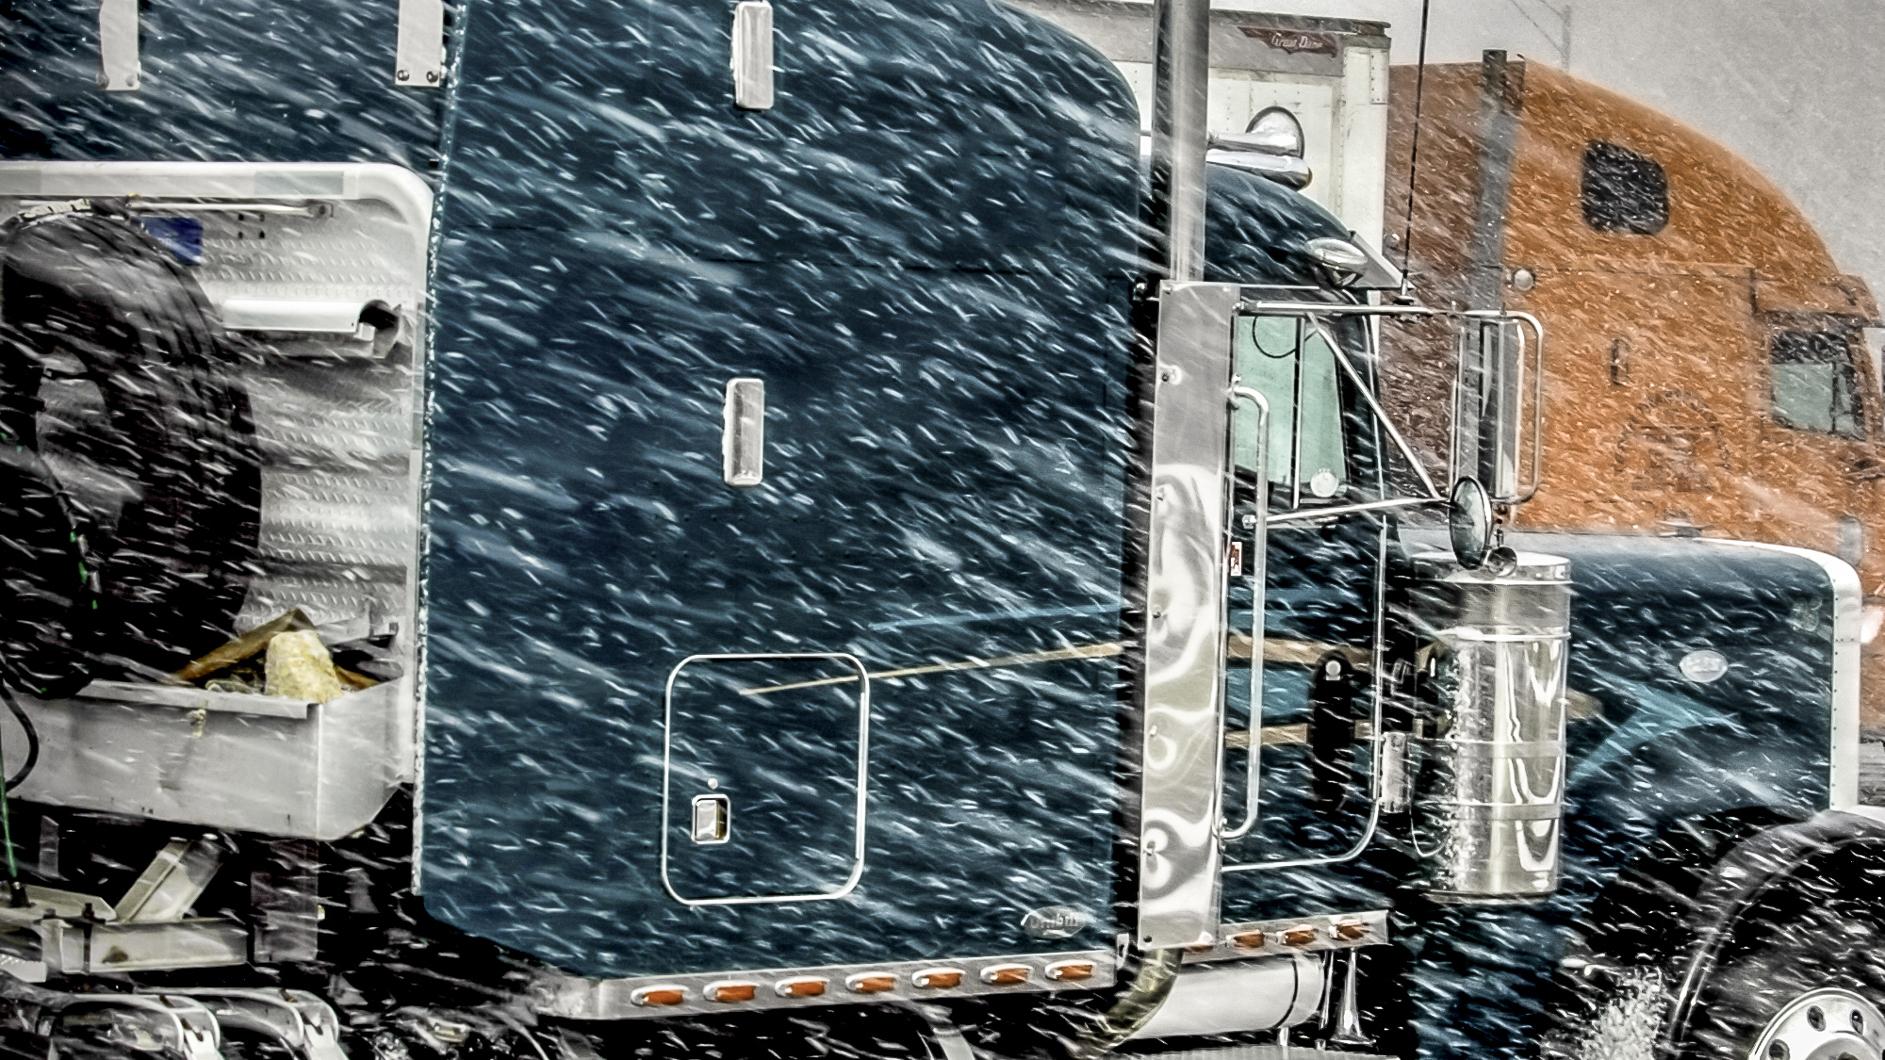 Truckstock_blizzard_1.jpg